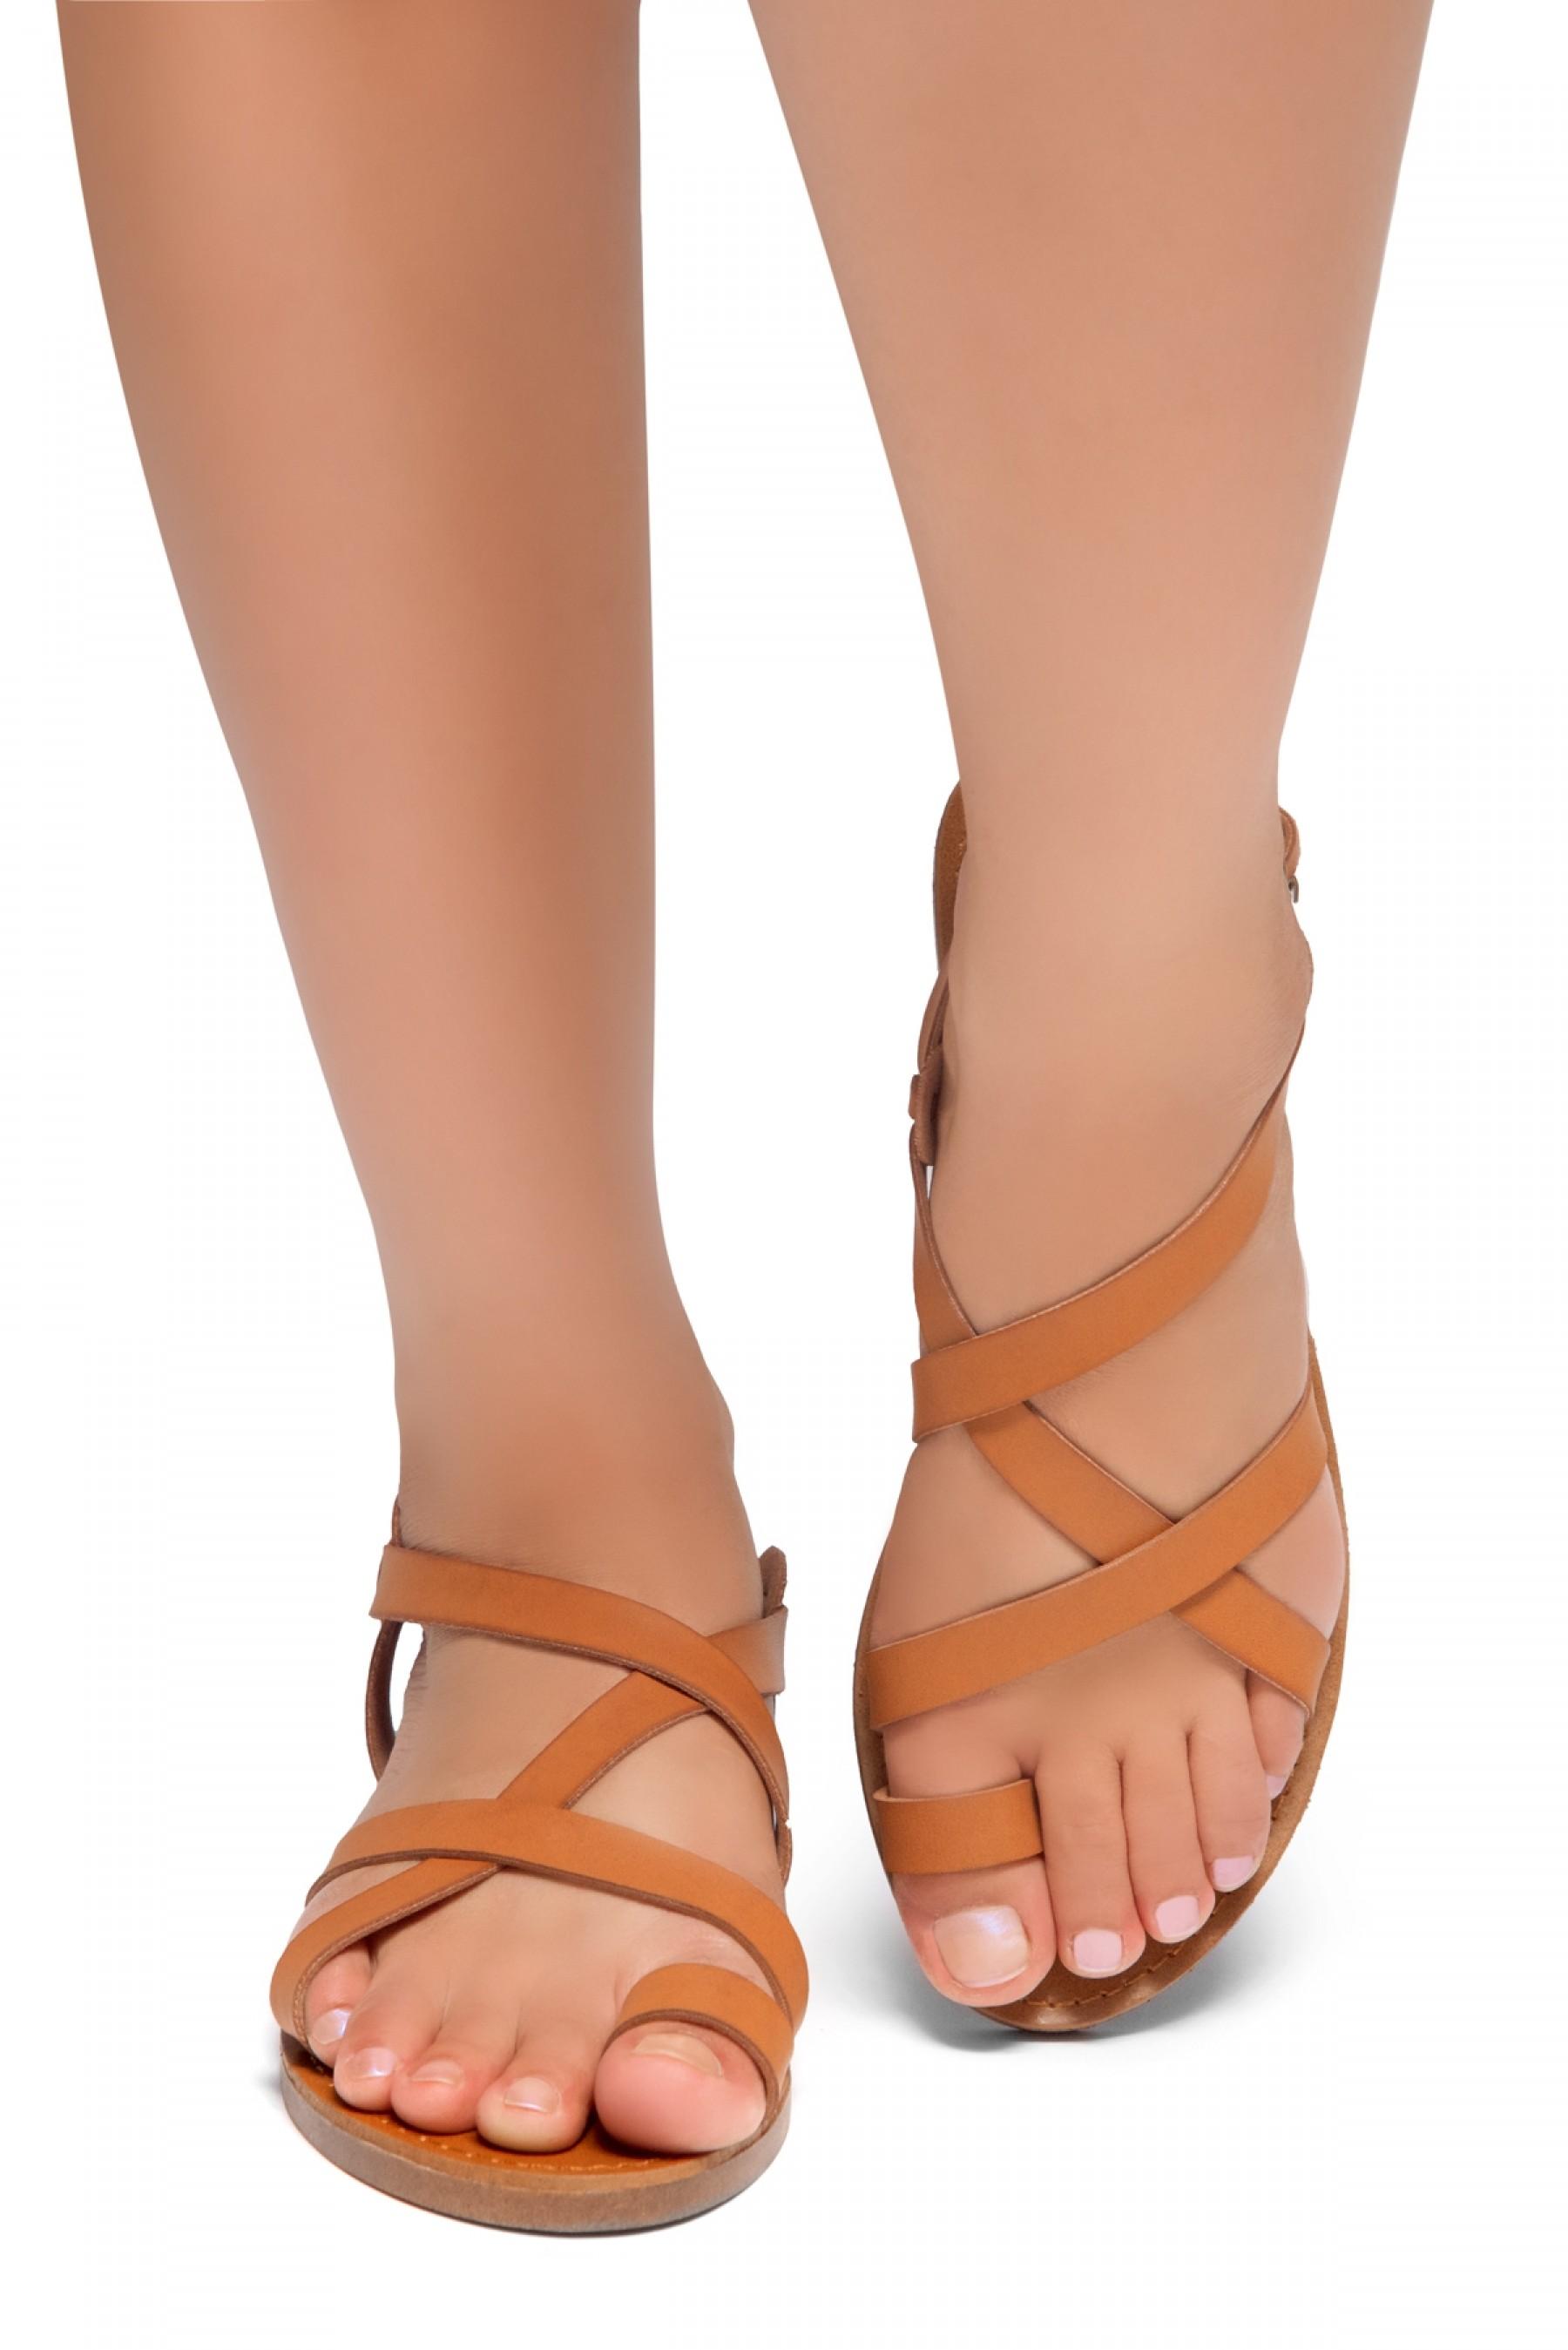 HerStyle Lulla-Toe Ring Sandal with Unique Crisscross Straps (Cognac)